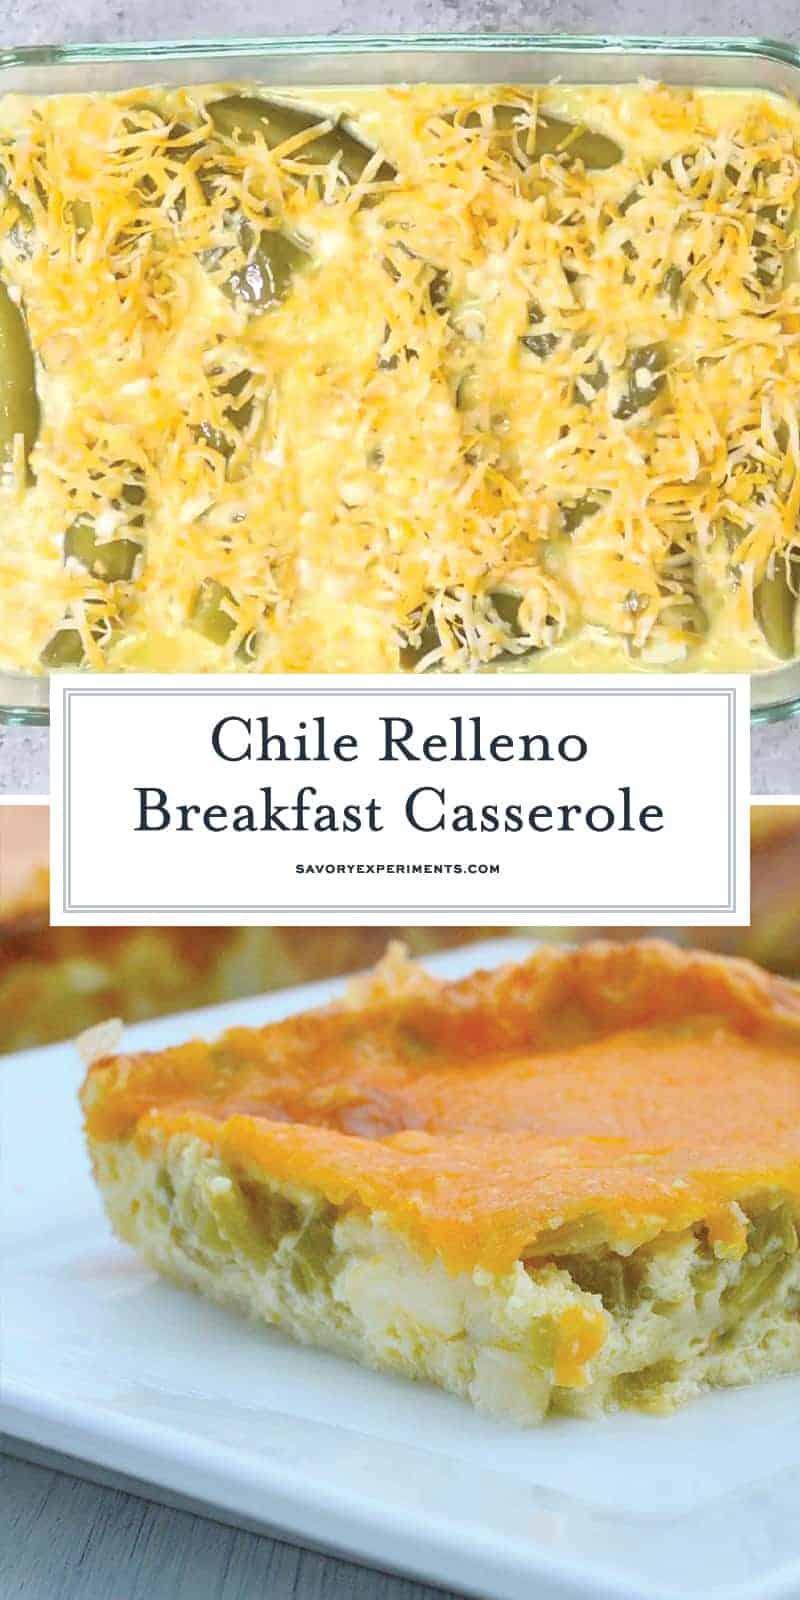 Chile Relleno Casserole on Pinterest